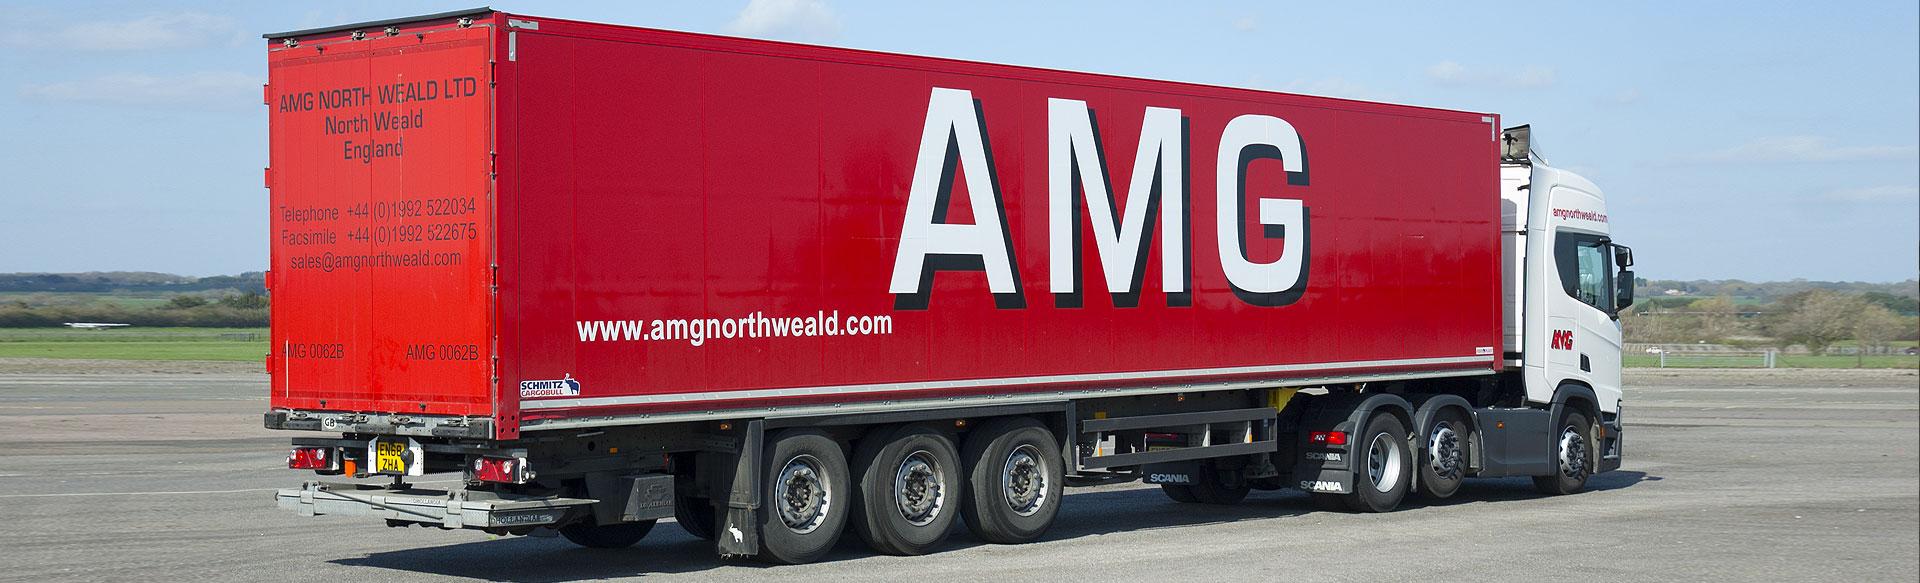 AMG Box Trailer at North Weald Airfield, Essex